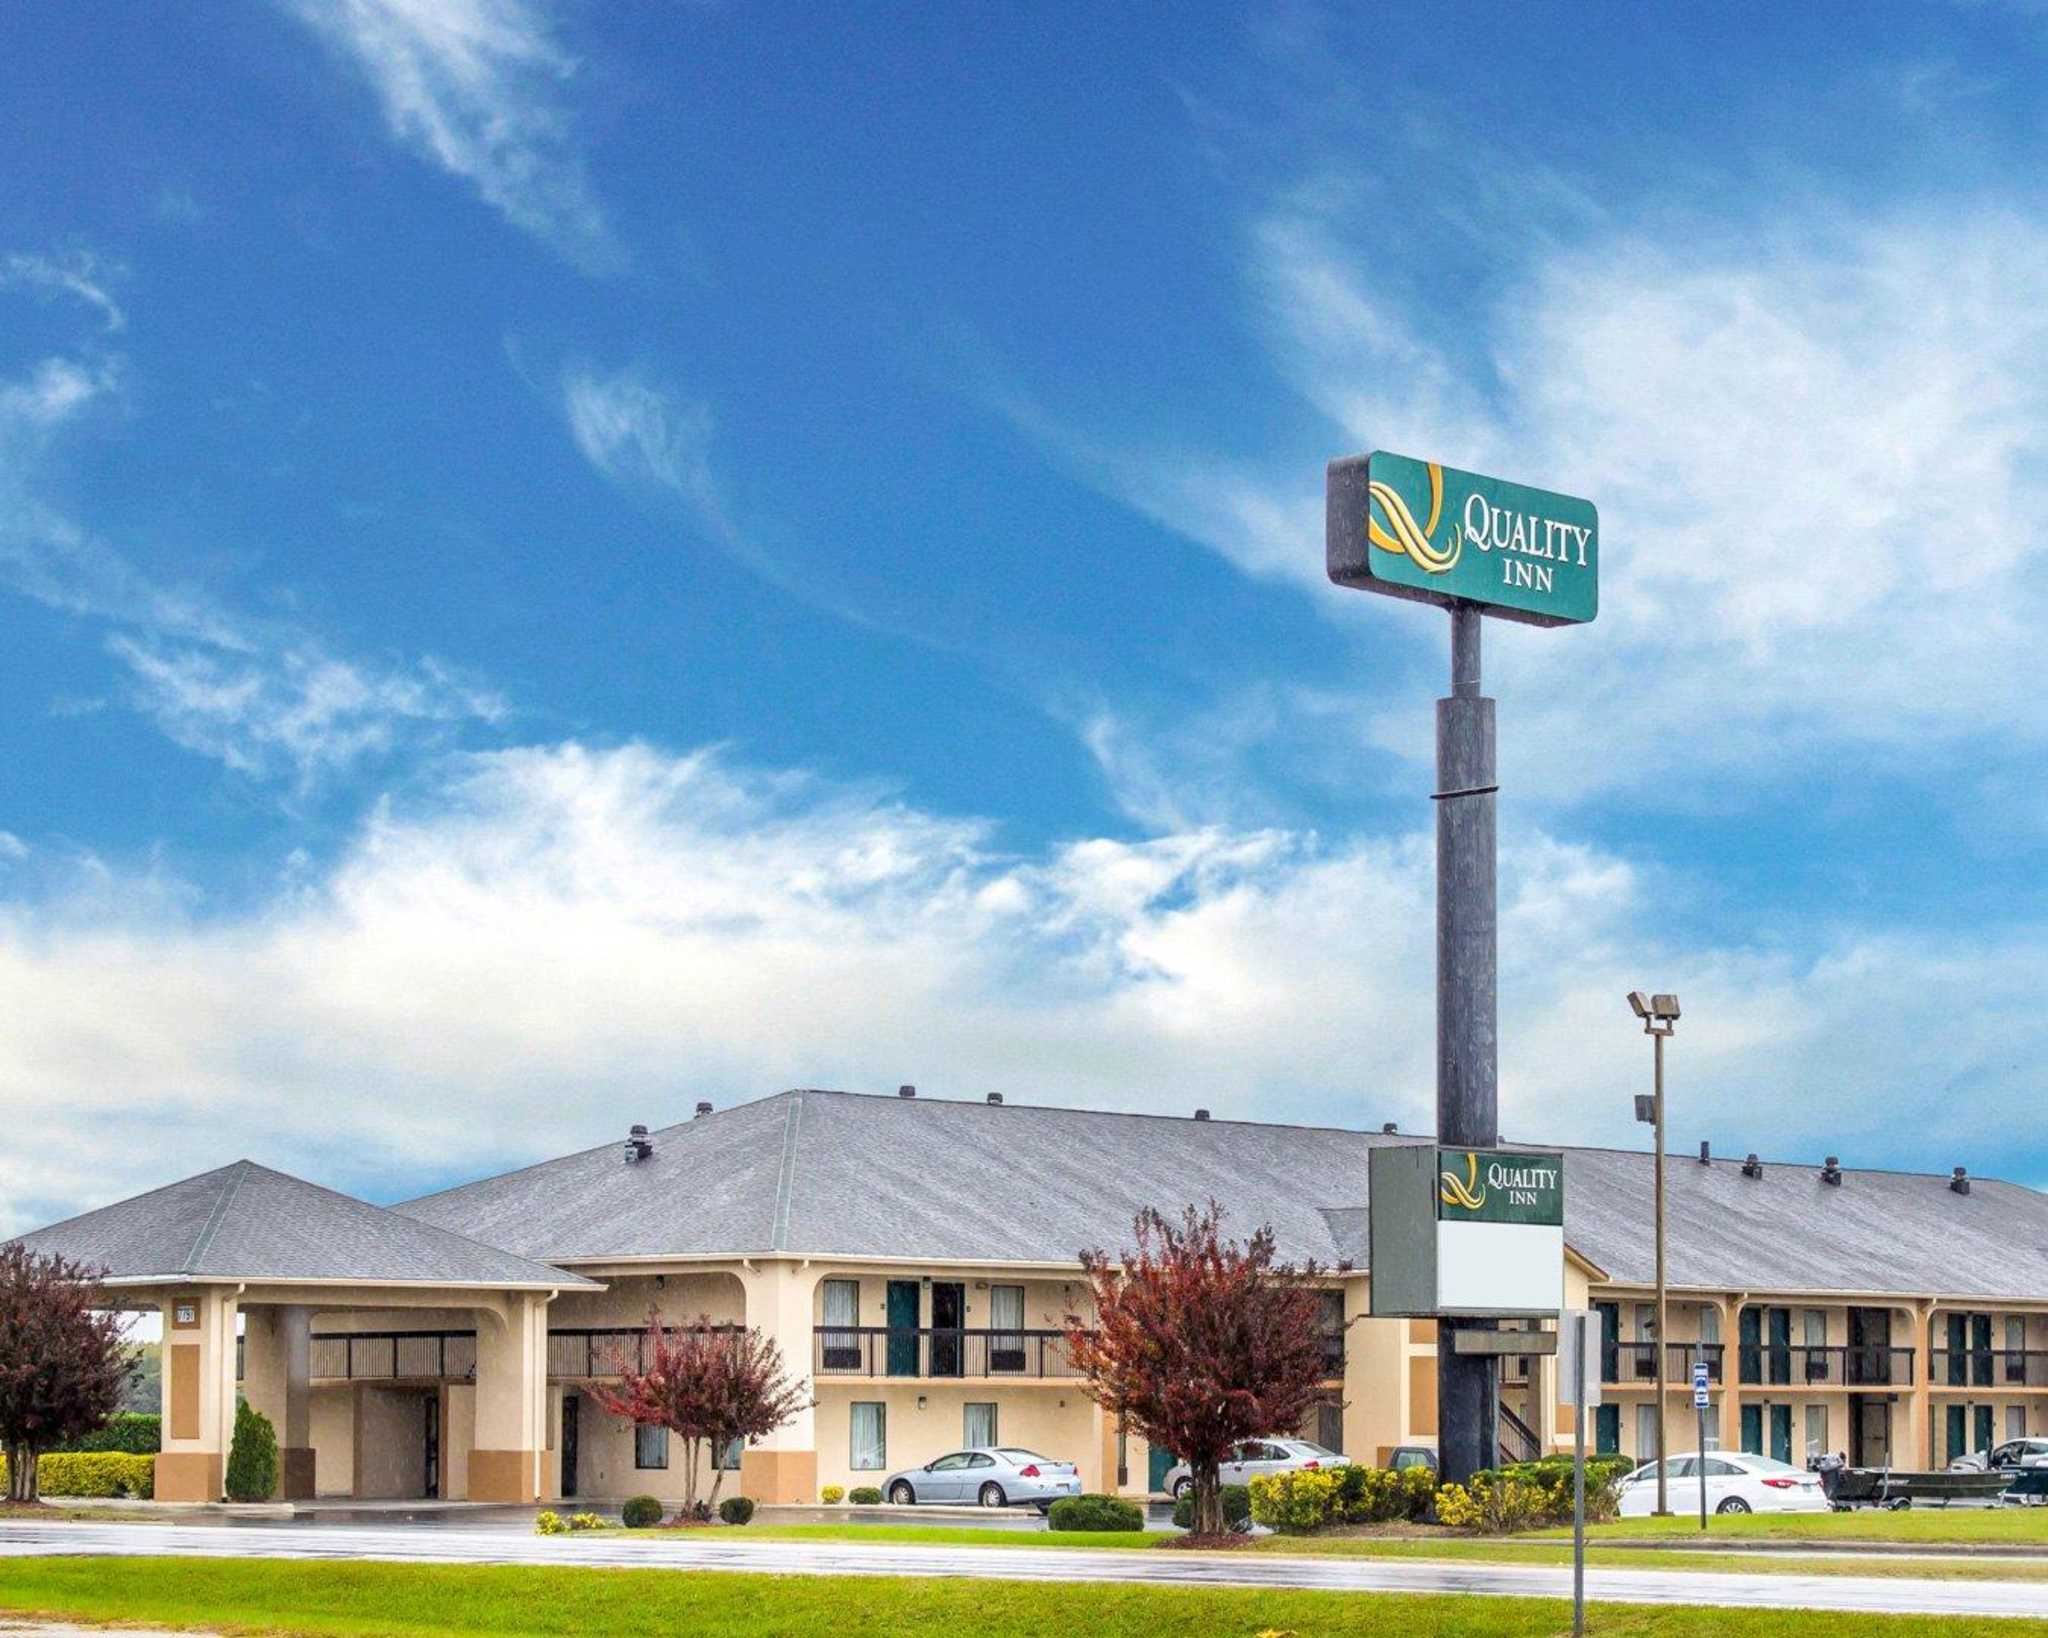 Quality Inn North, Battleboro North Carolina (NC